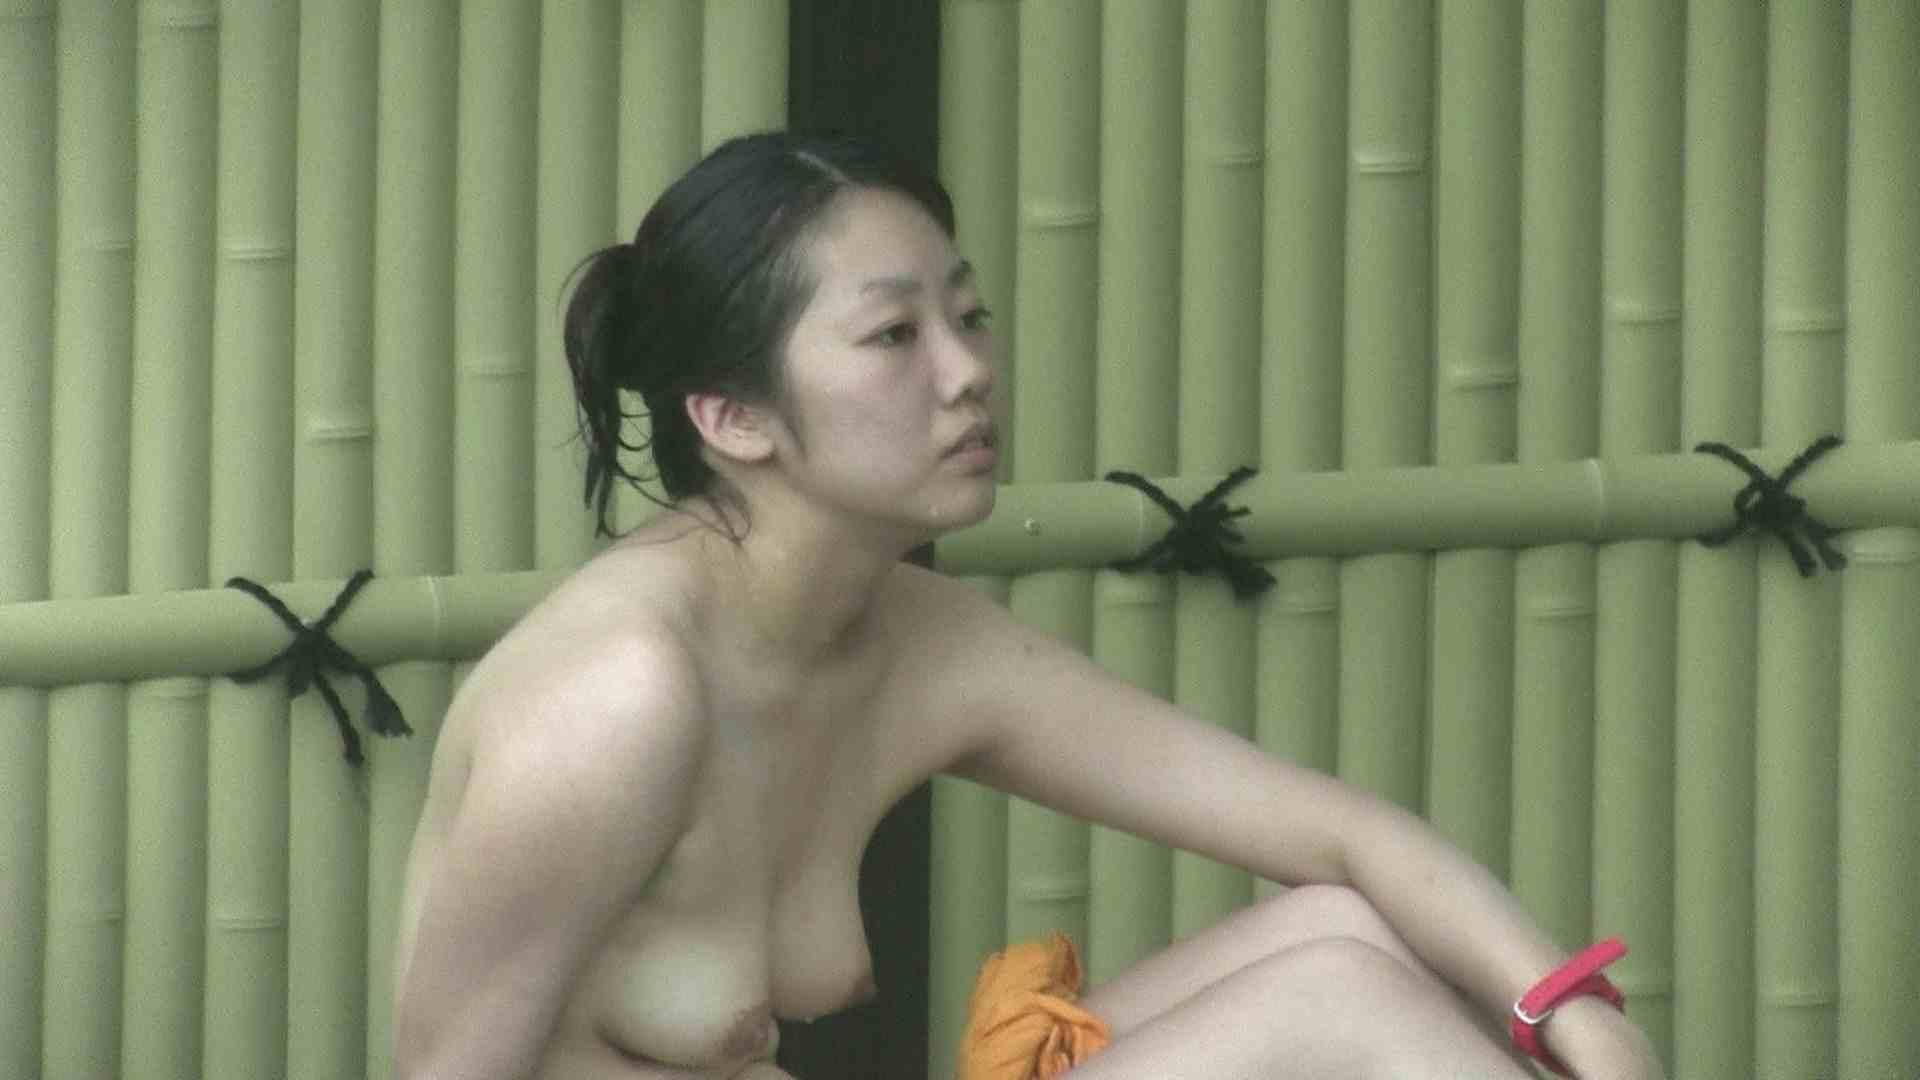 Aquaな露天風呂Vol.194 露天風呂編  110PIX 10